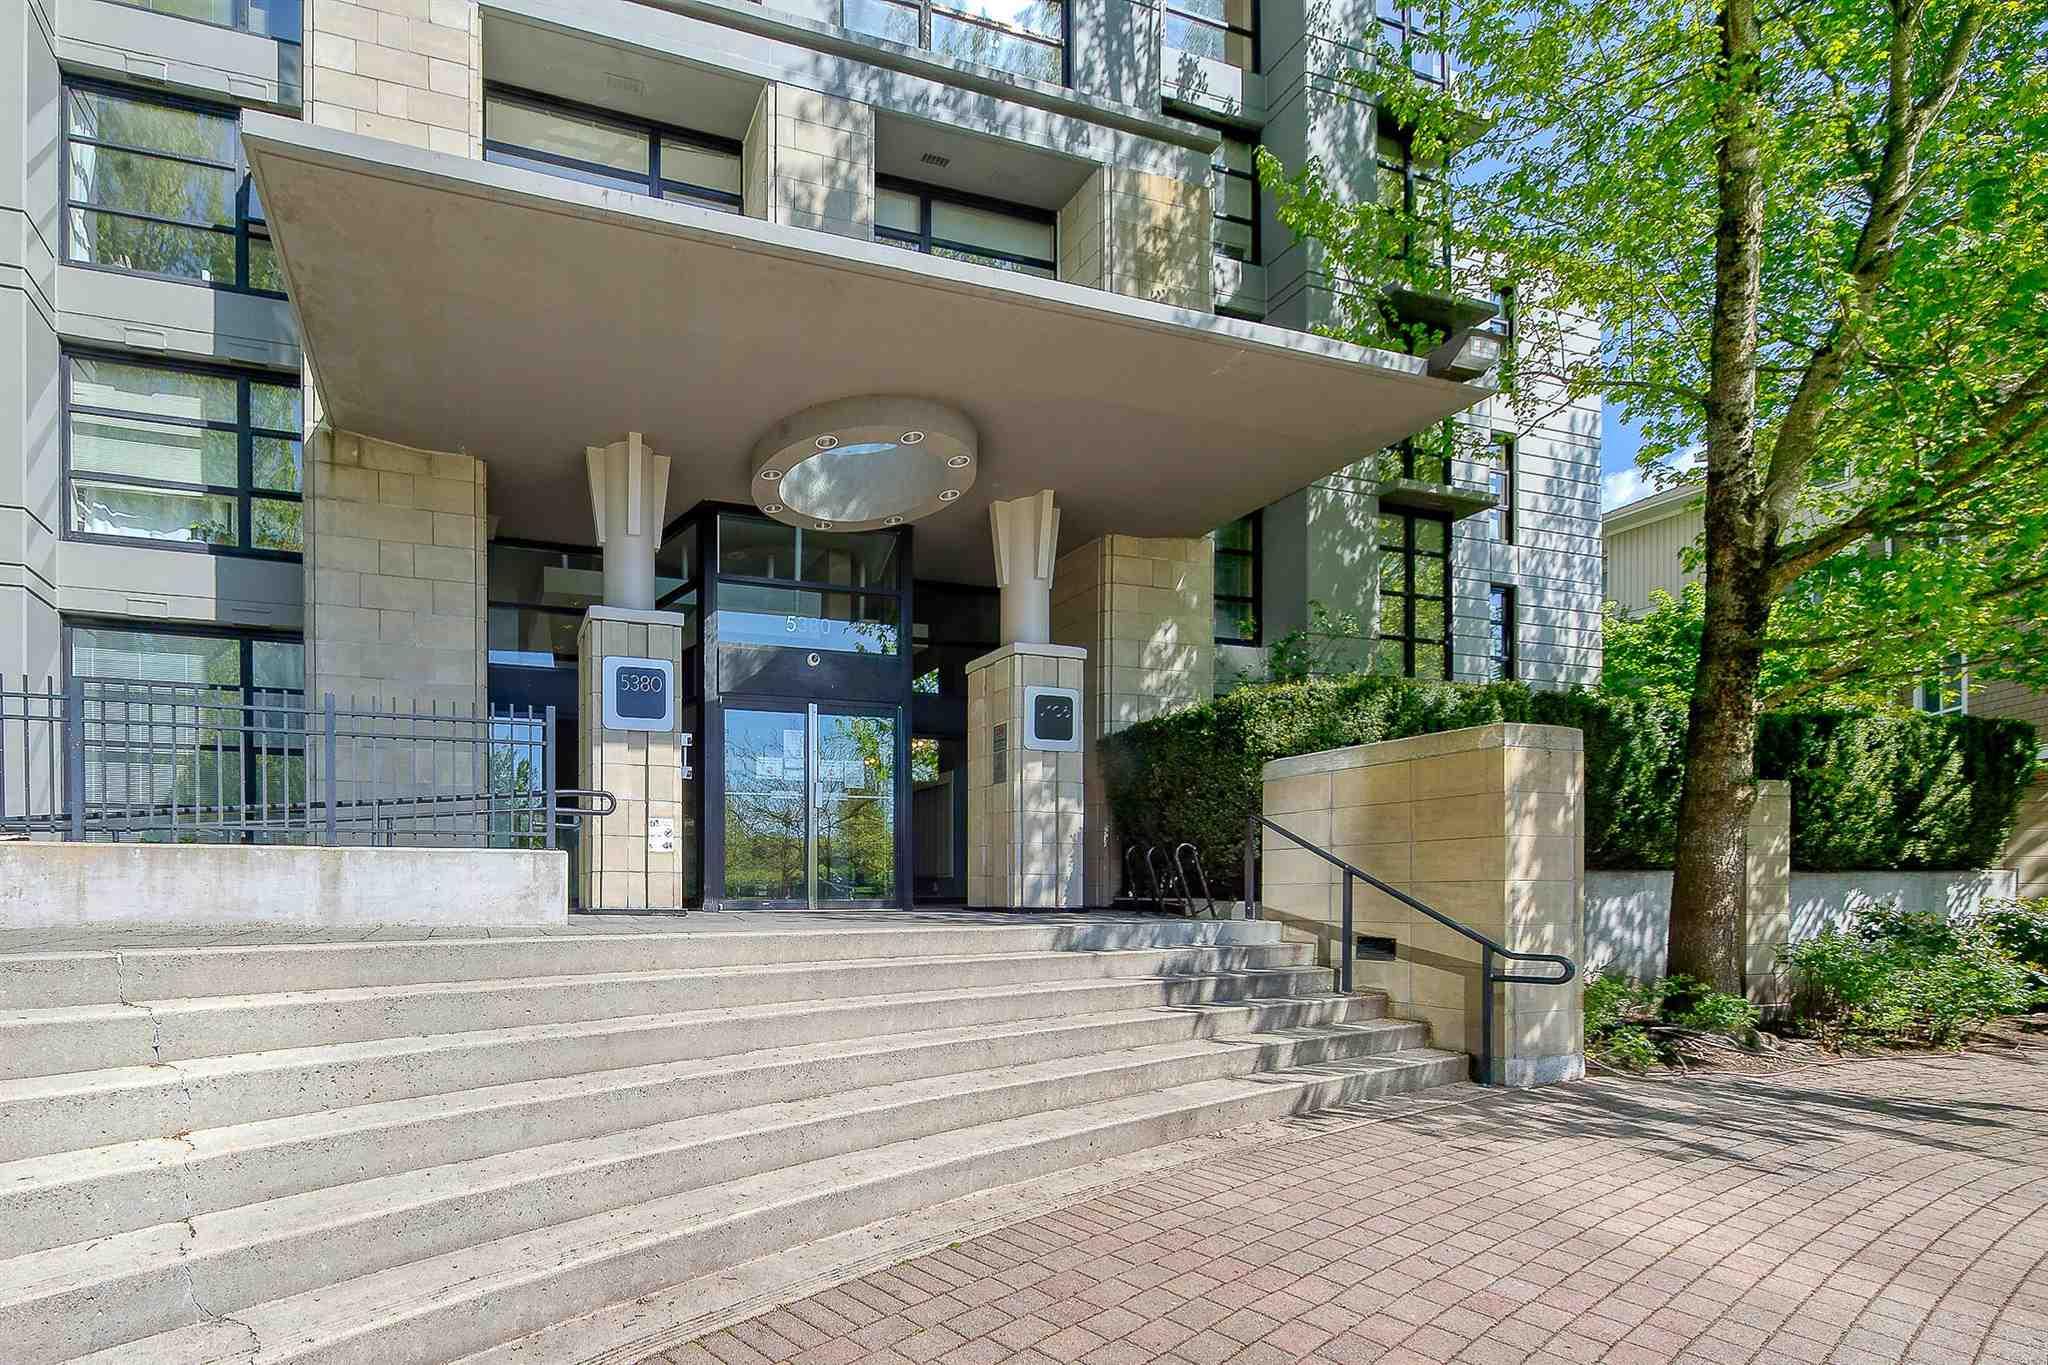 1109 5380 OBEN STREET - Collingwood VE Apartment/Condo for sale, 2 Bedrooms (R2603385) - #1